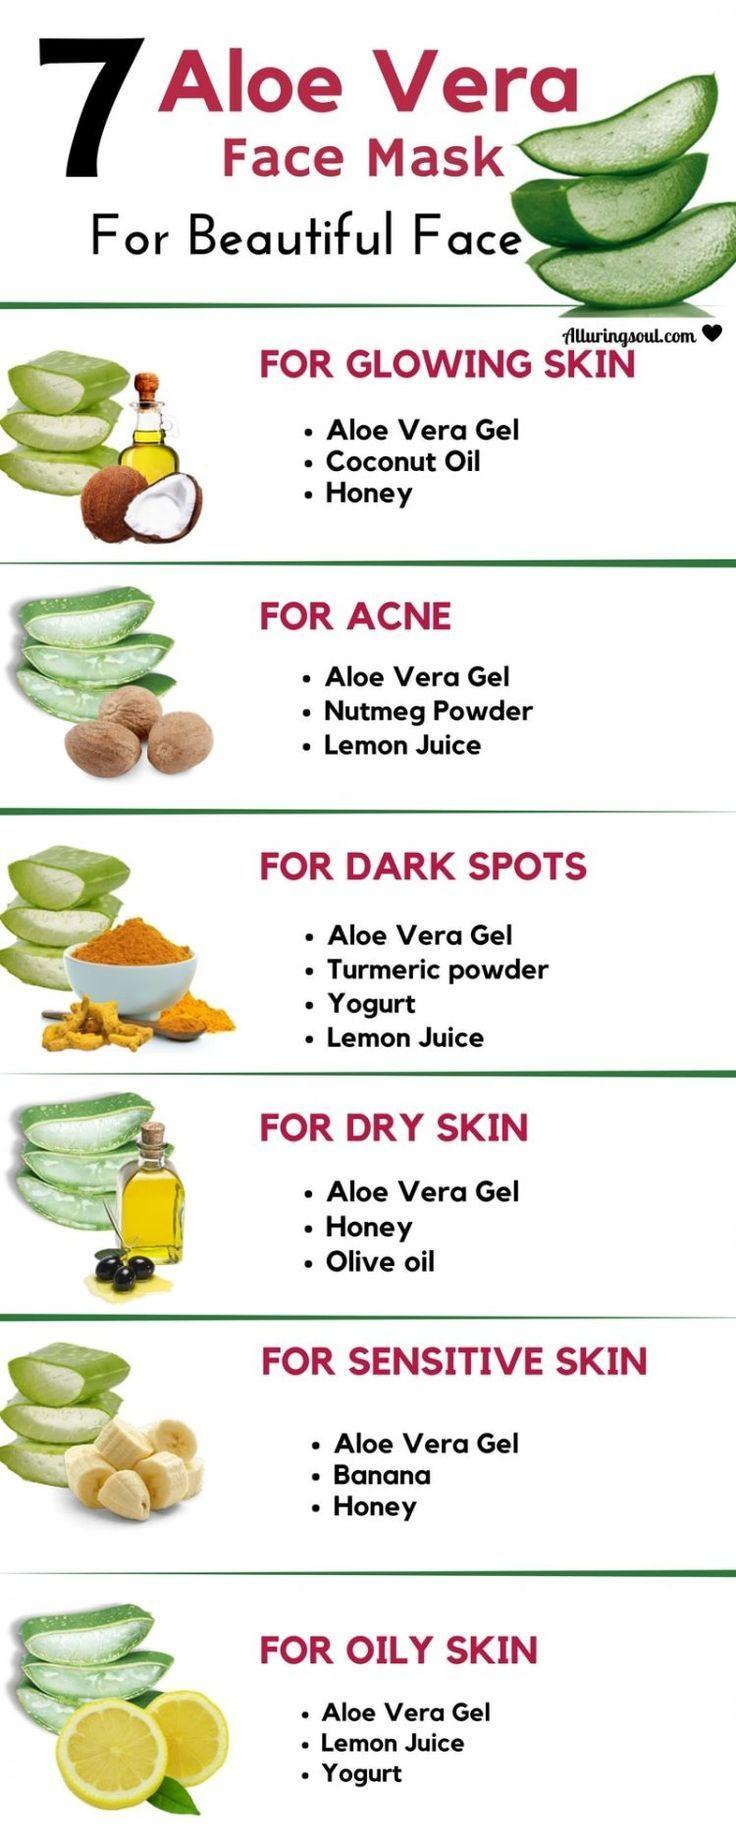 11 Aloe Vera Face Mask For Bright And Beautiful Skin in 11  Aloe